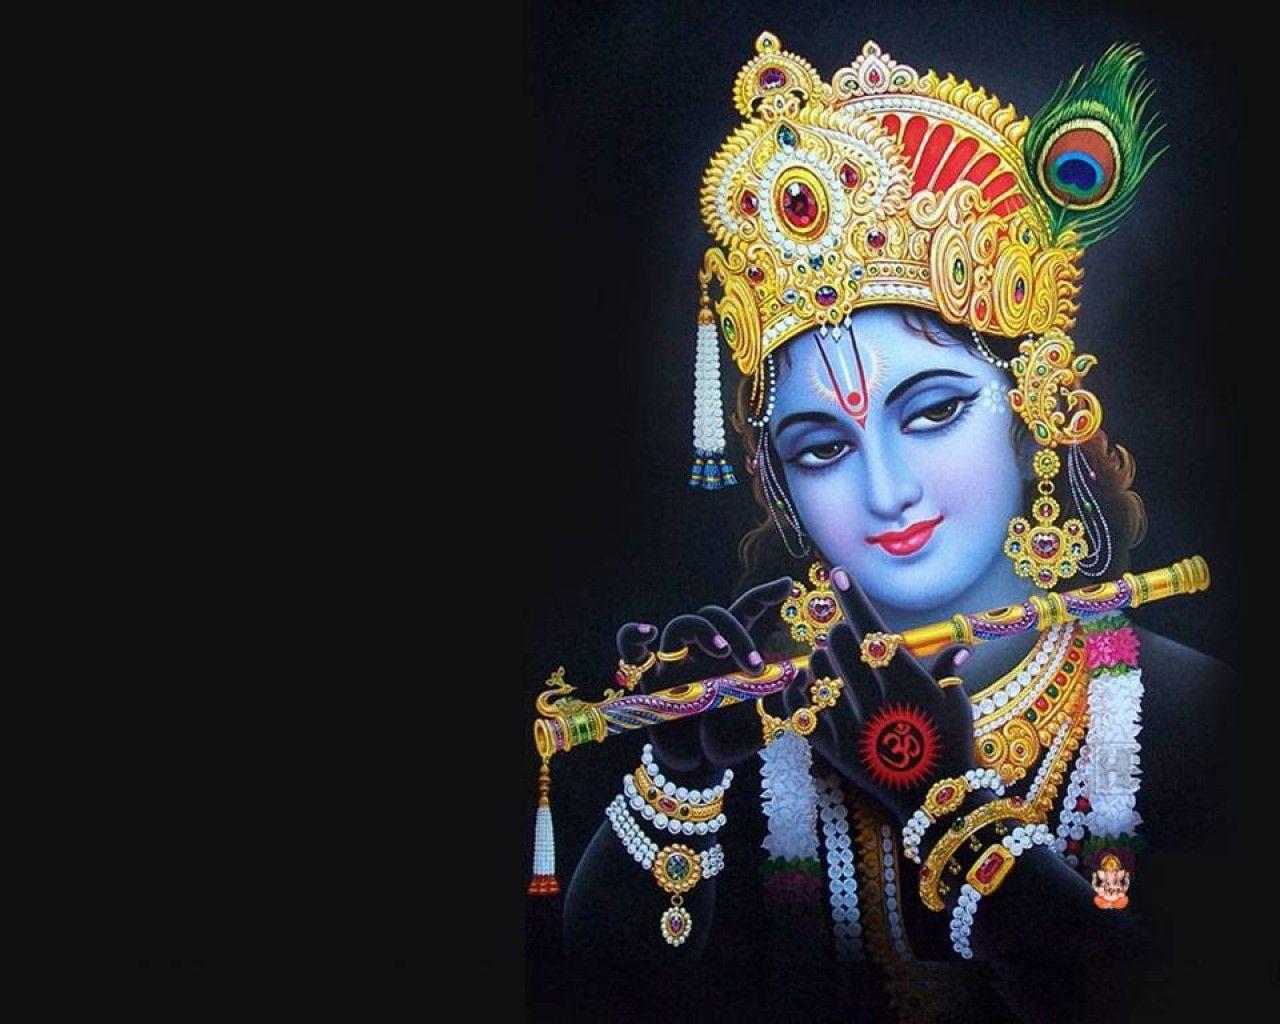 Lord Krishna Hd Wallpapers For Desktop Free Download U2013 Free Lord Krishna Wallpapers Krishna Wallpaper Lord Krishna Images